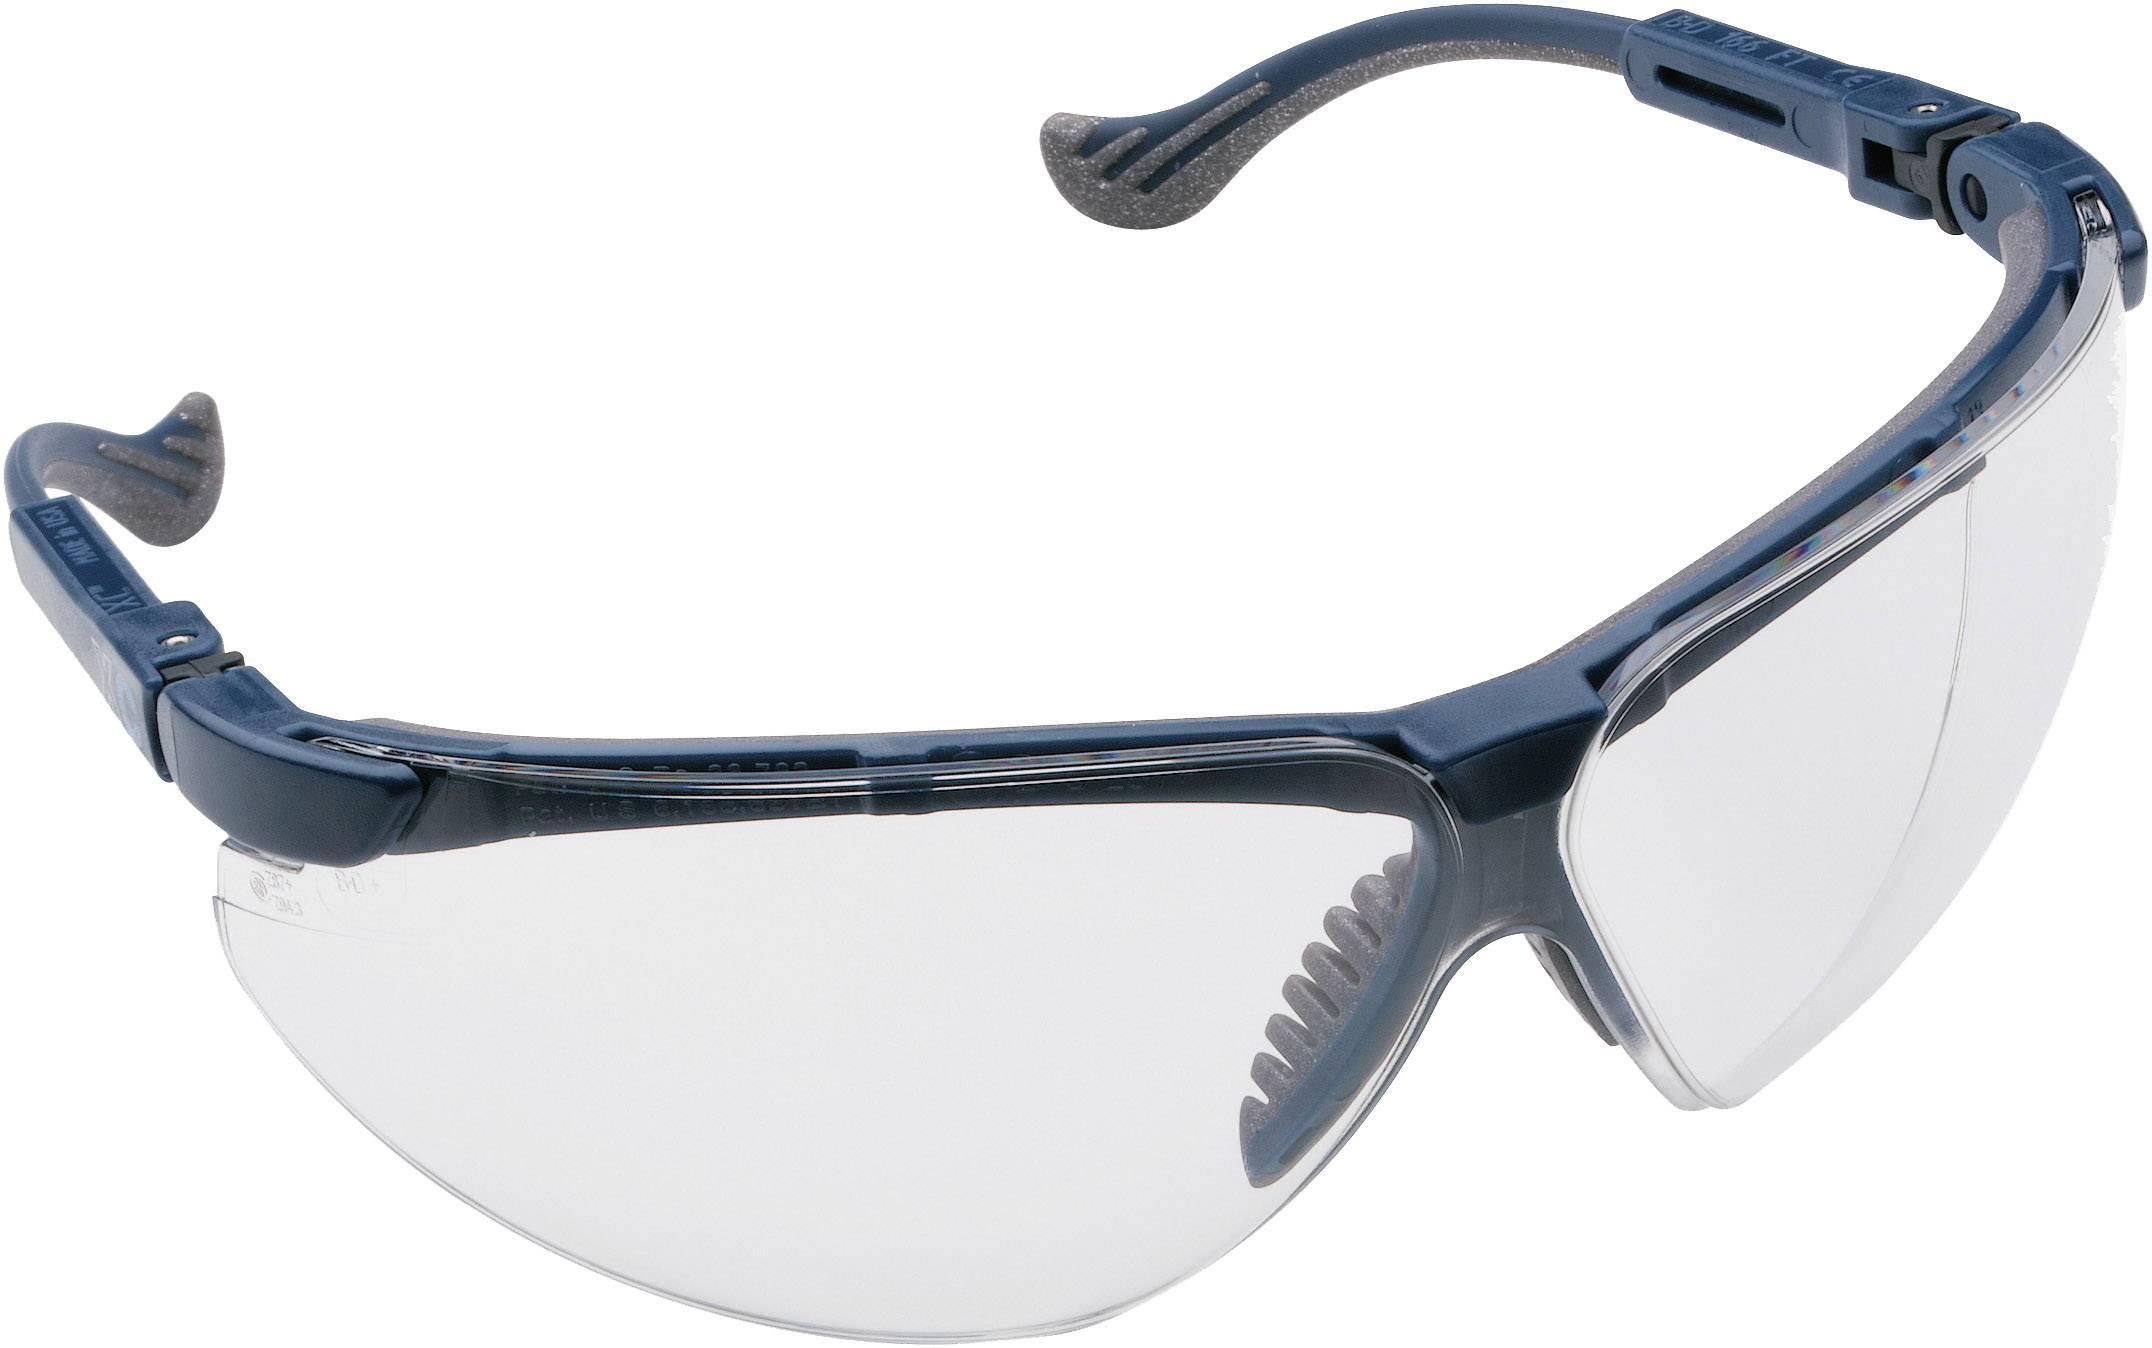 Ochranné brýle Pulsafe XC Version A/XC Fog Ban, 1011027, transparentní